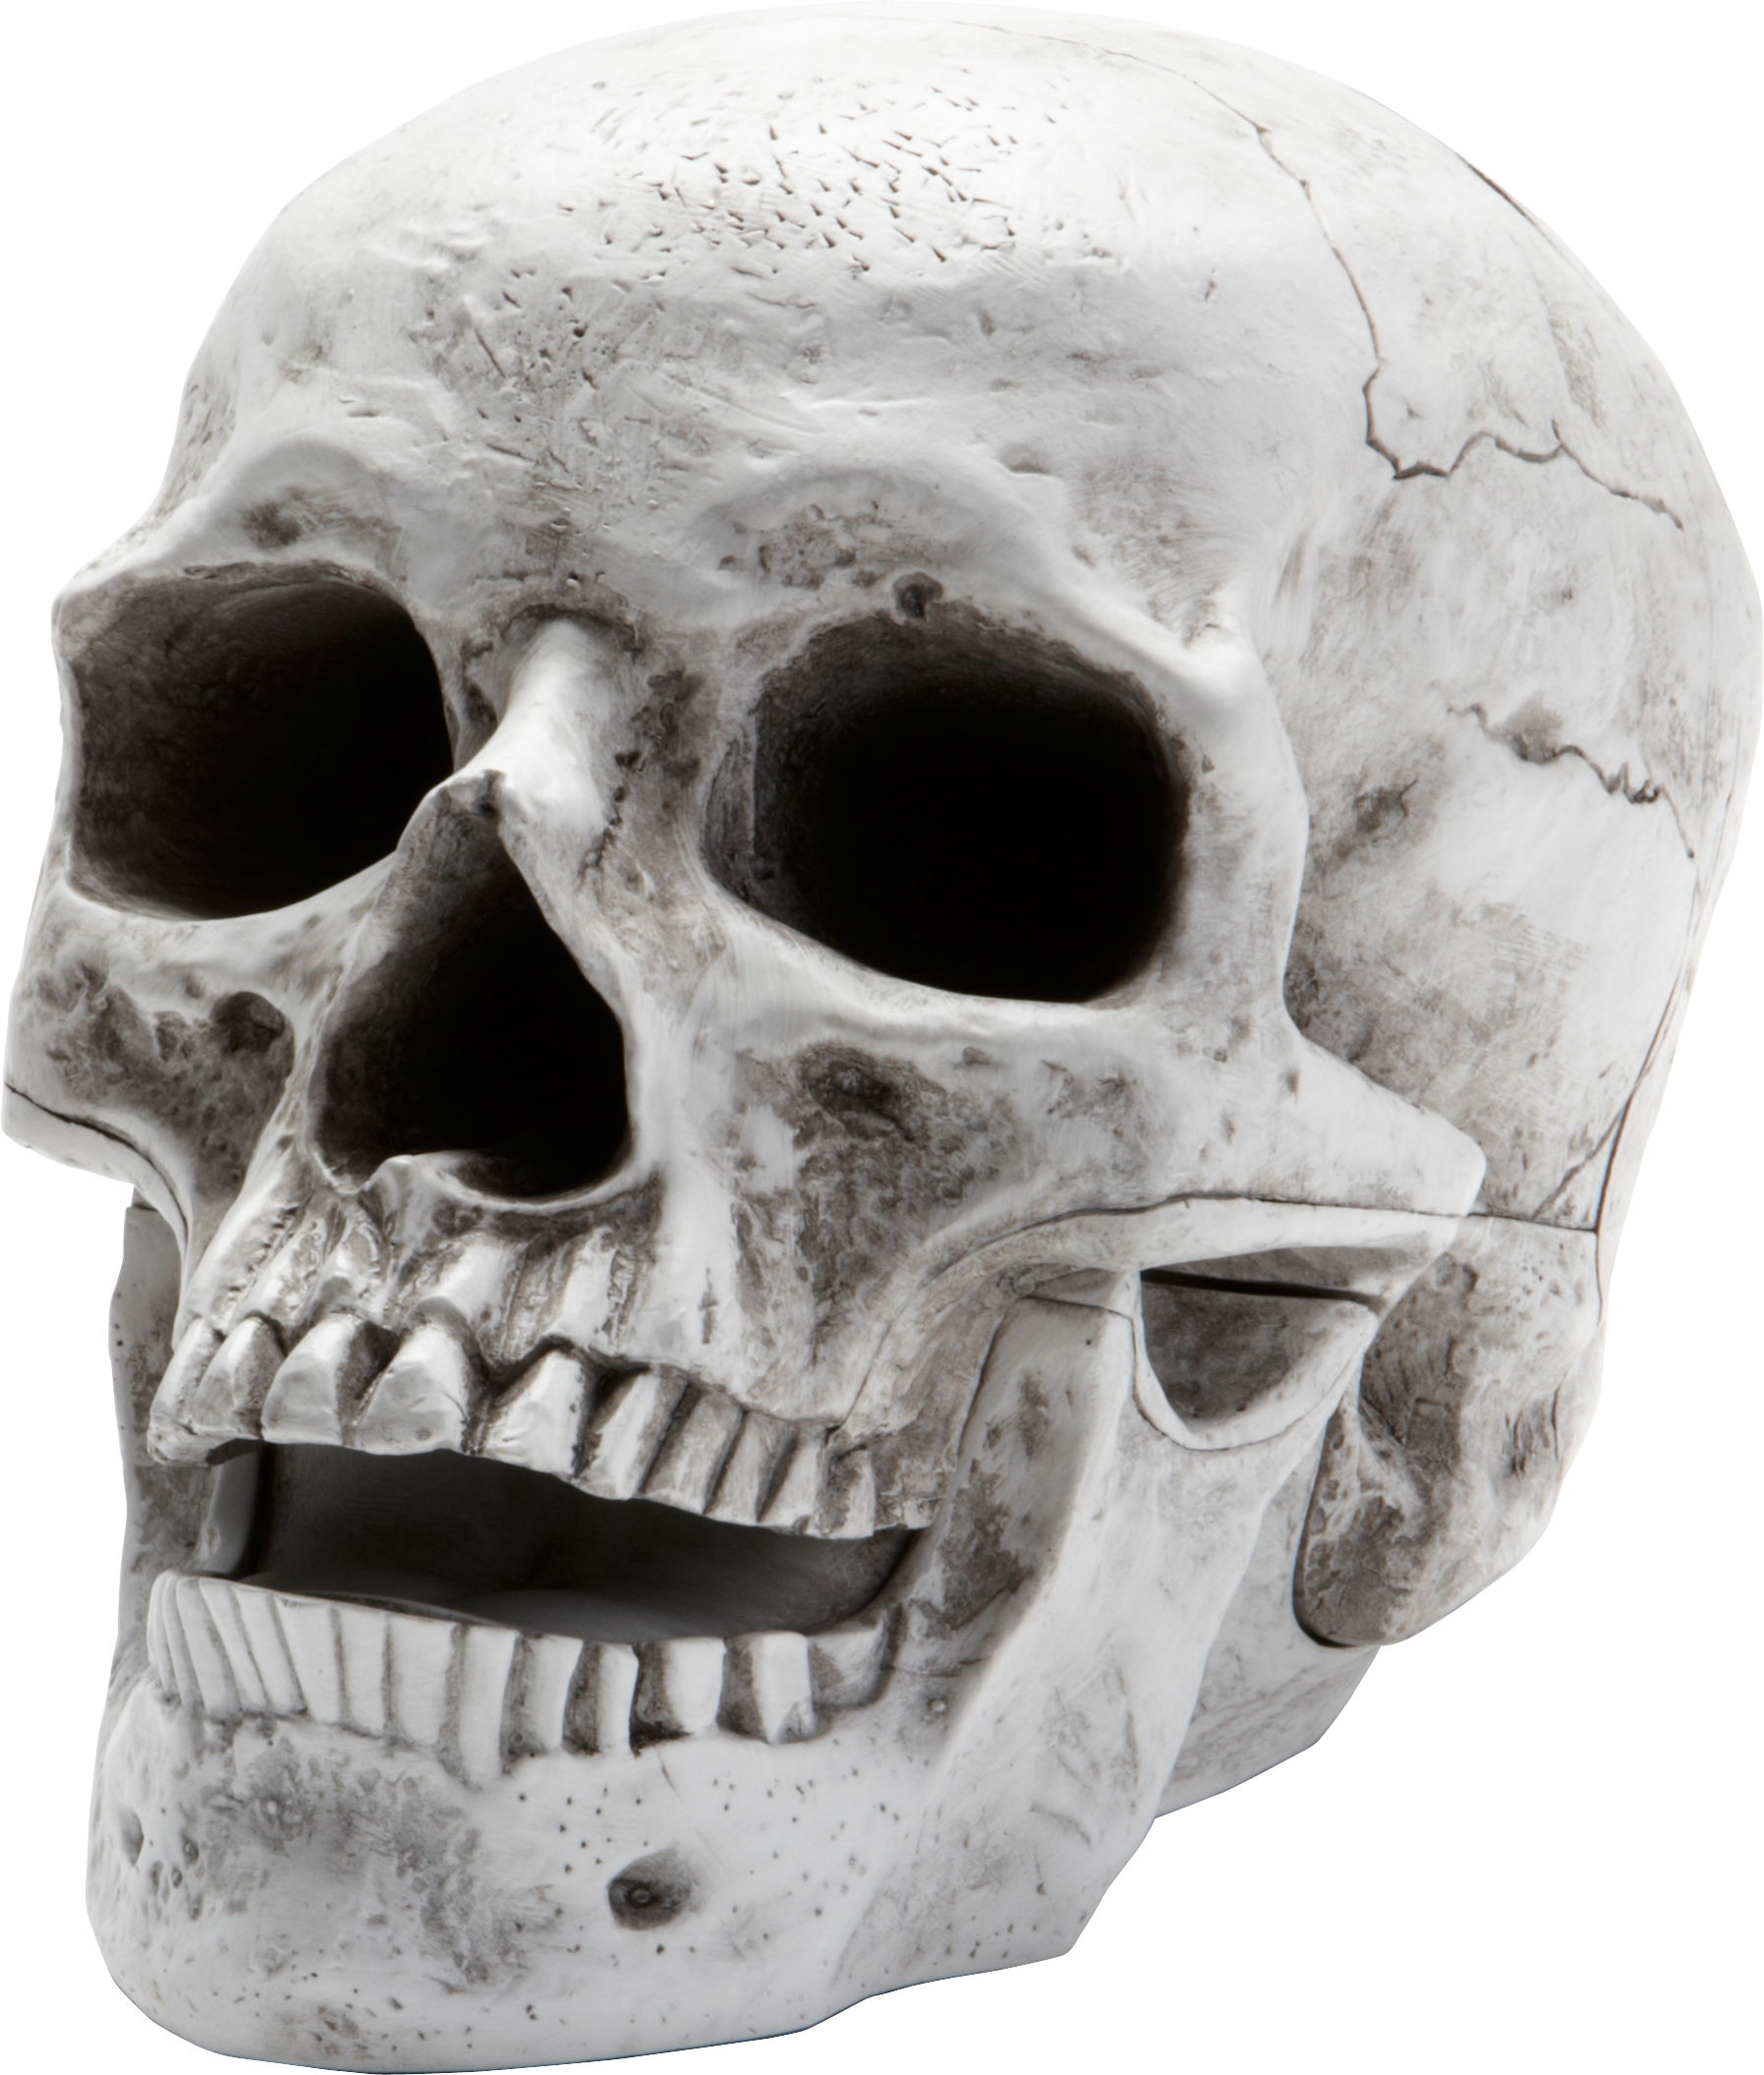 Skull PNG - 15807